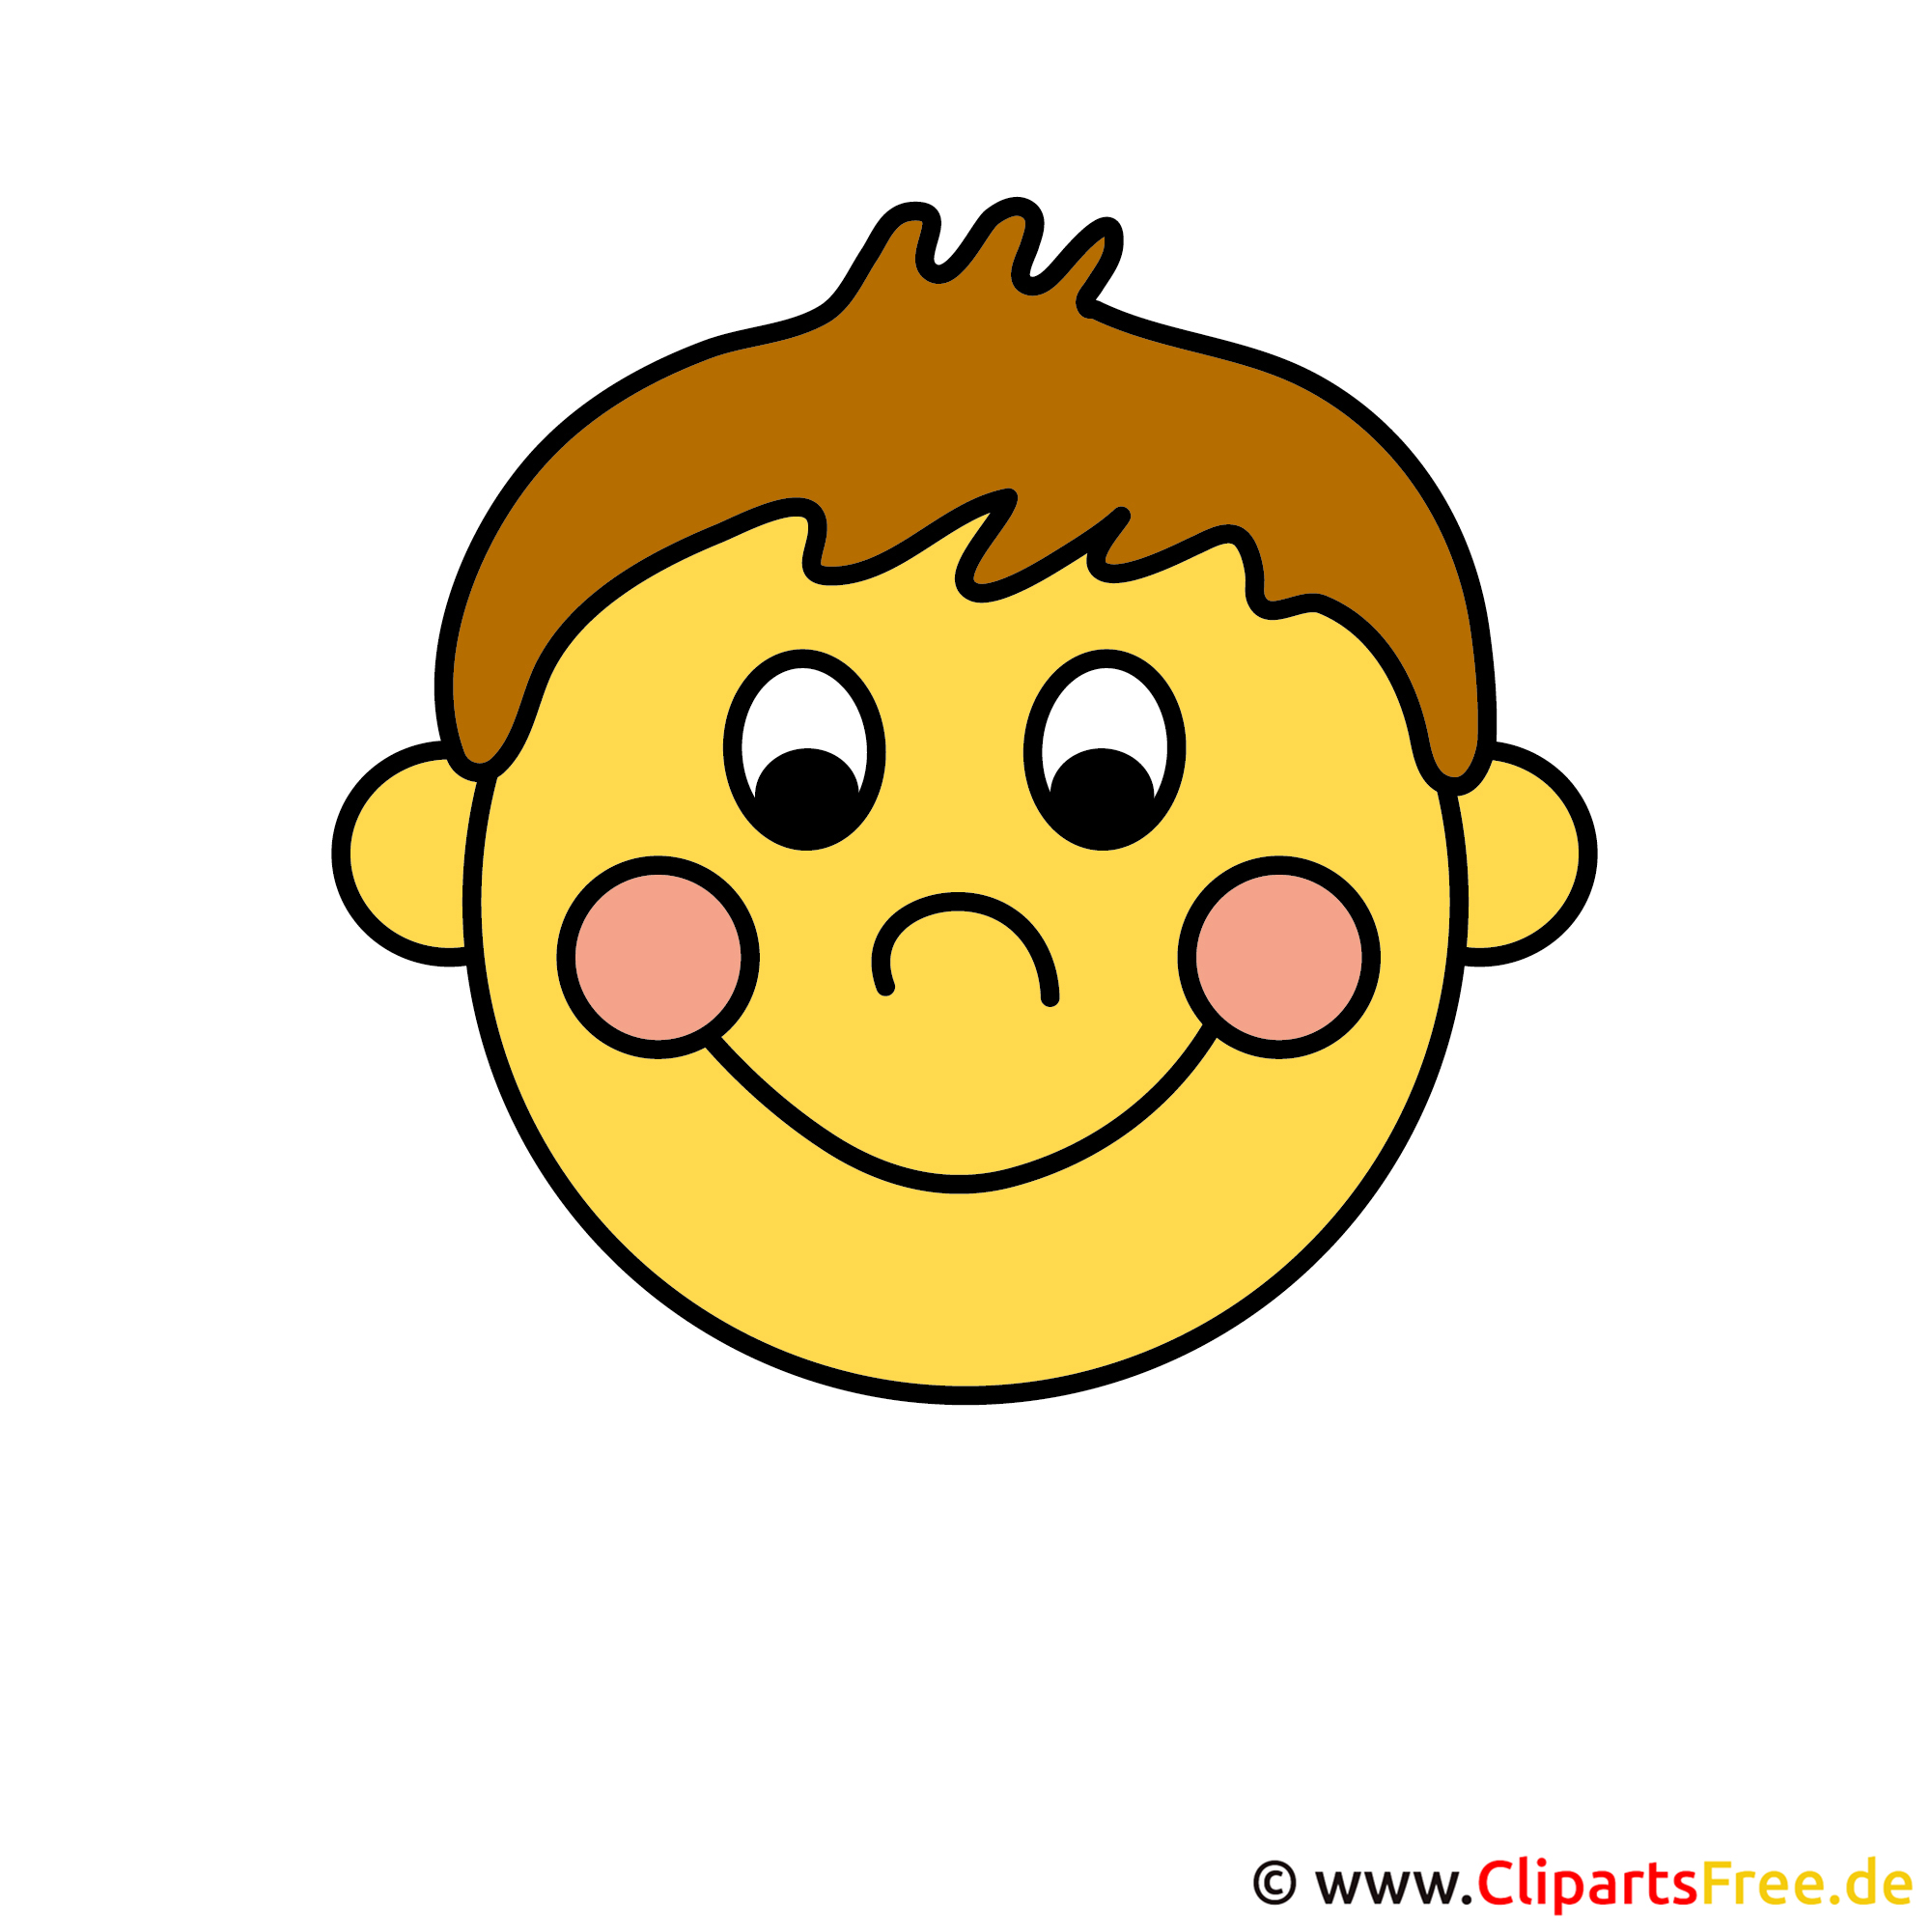 Smile Clipart download kostenlos